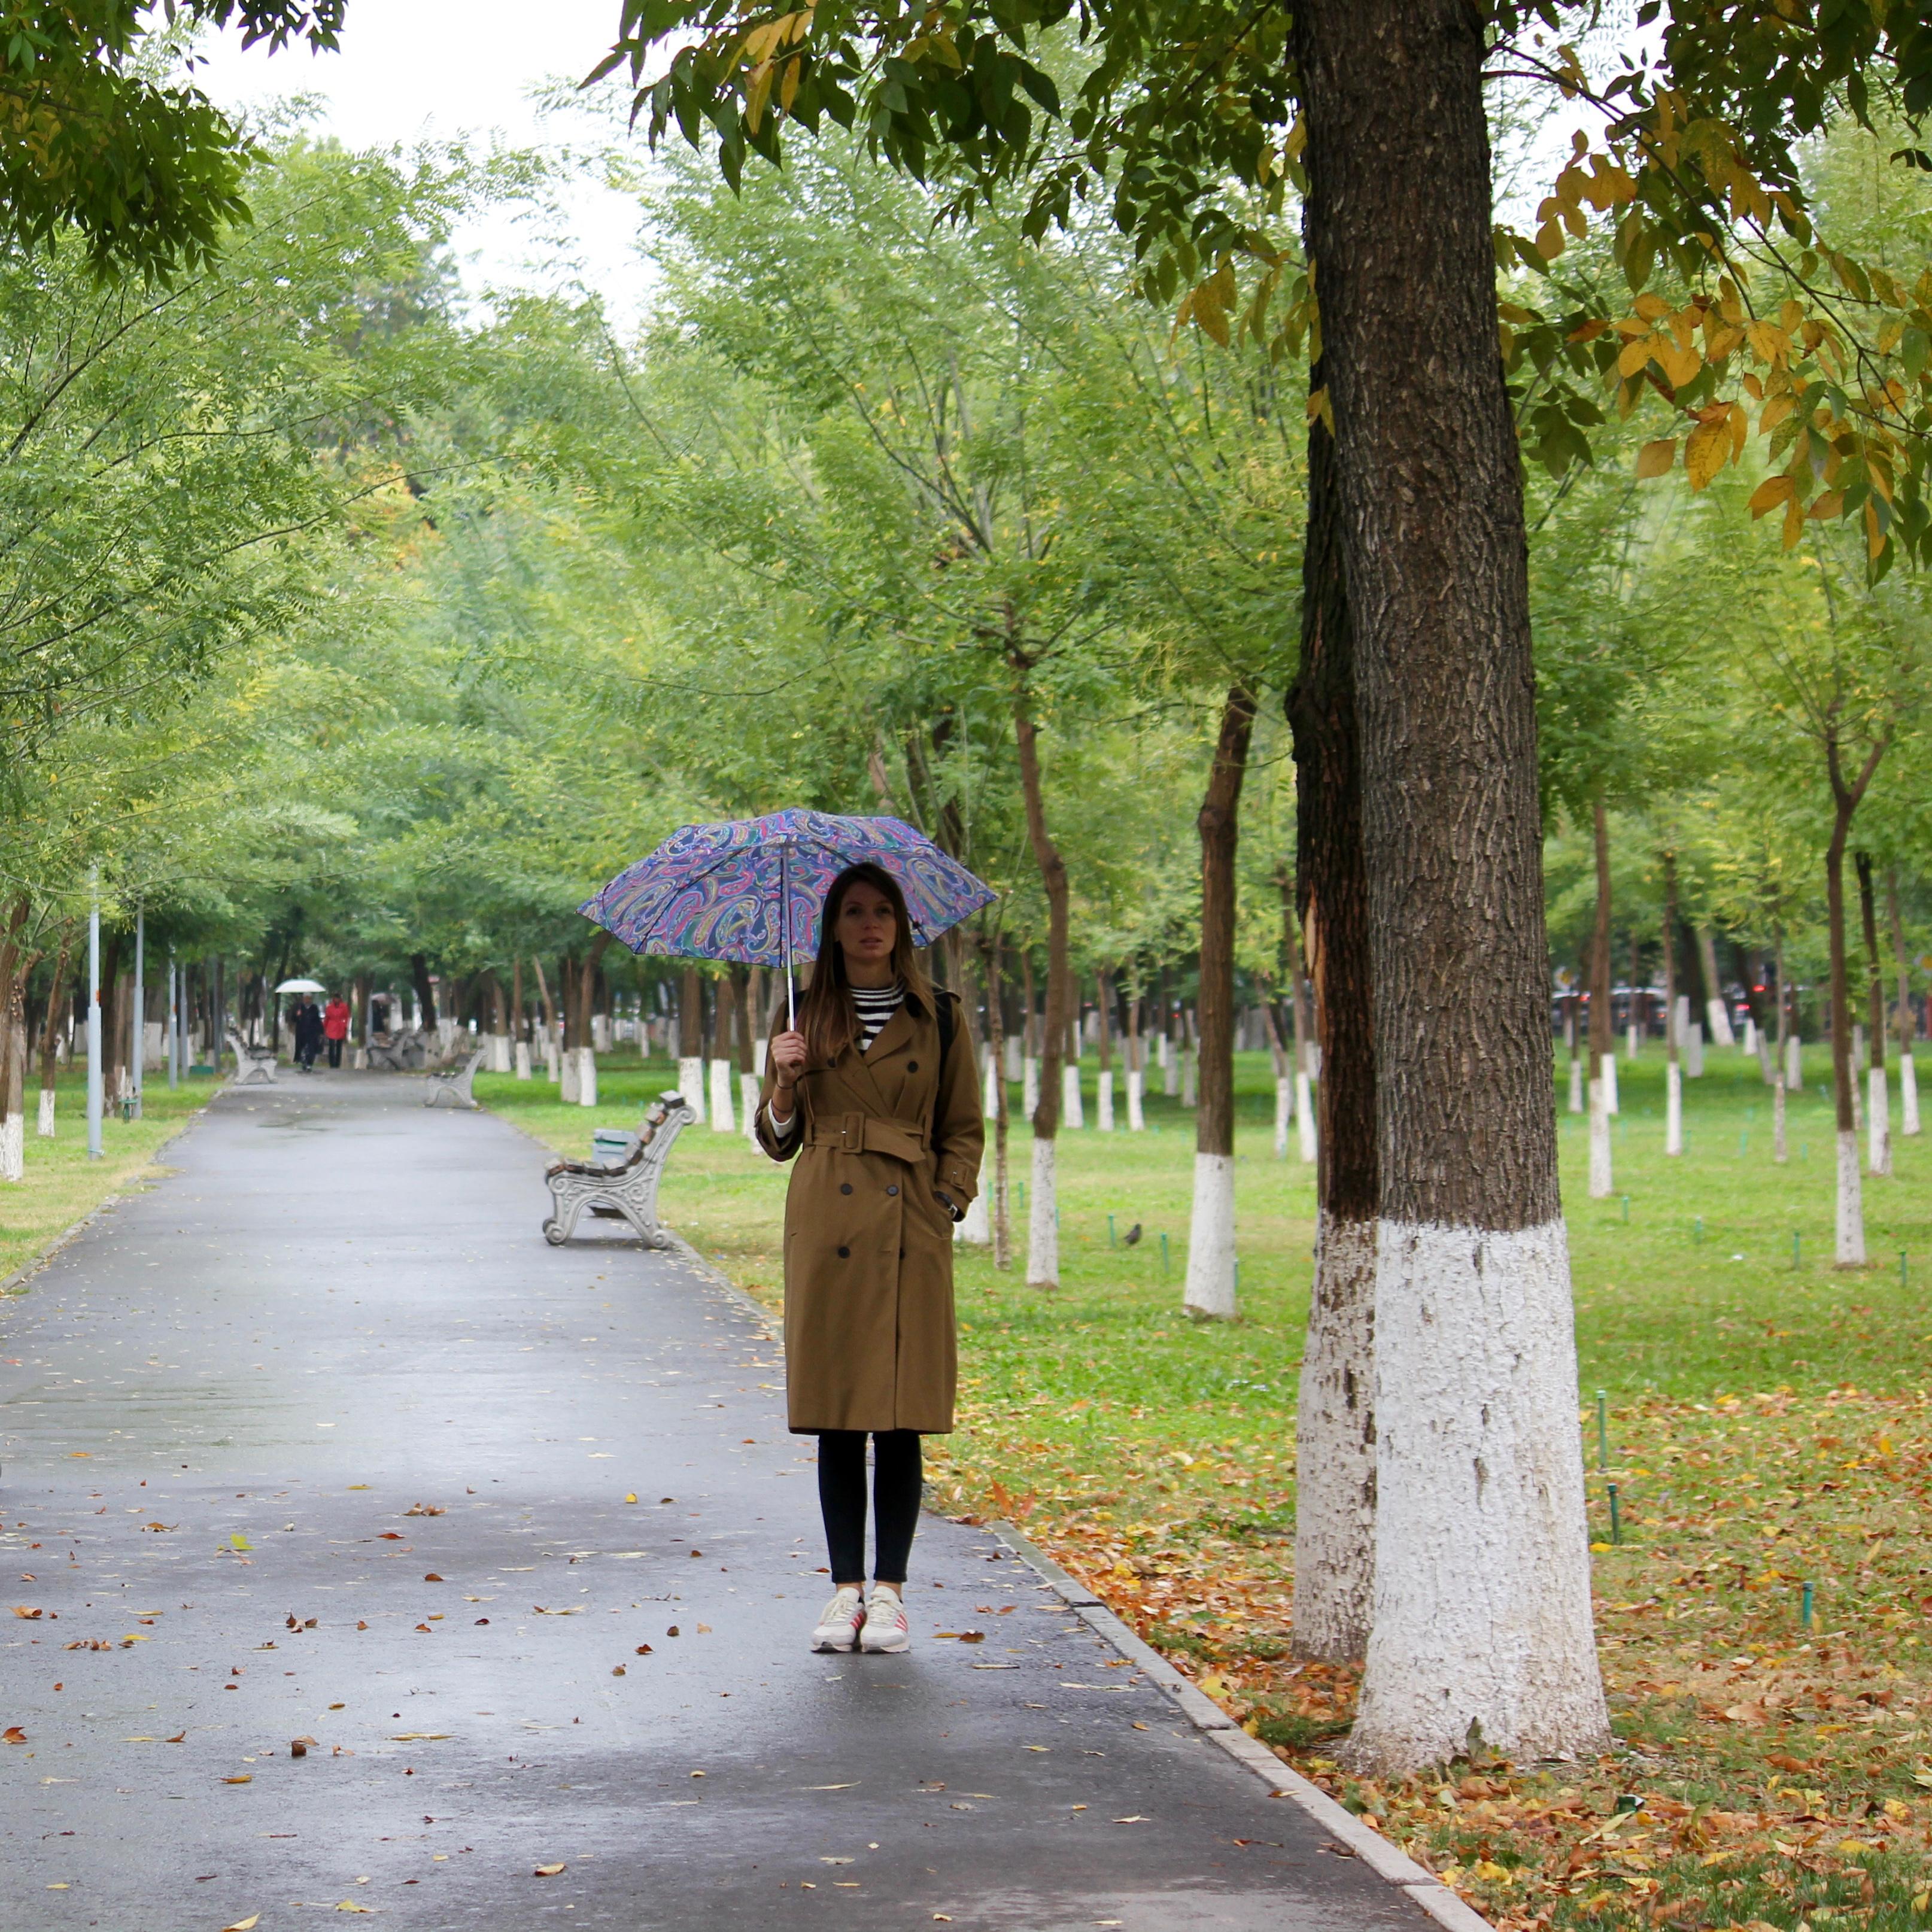 tashkent, uzbekistan - 5